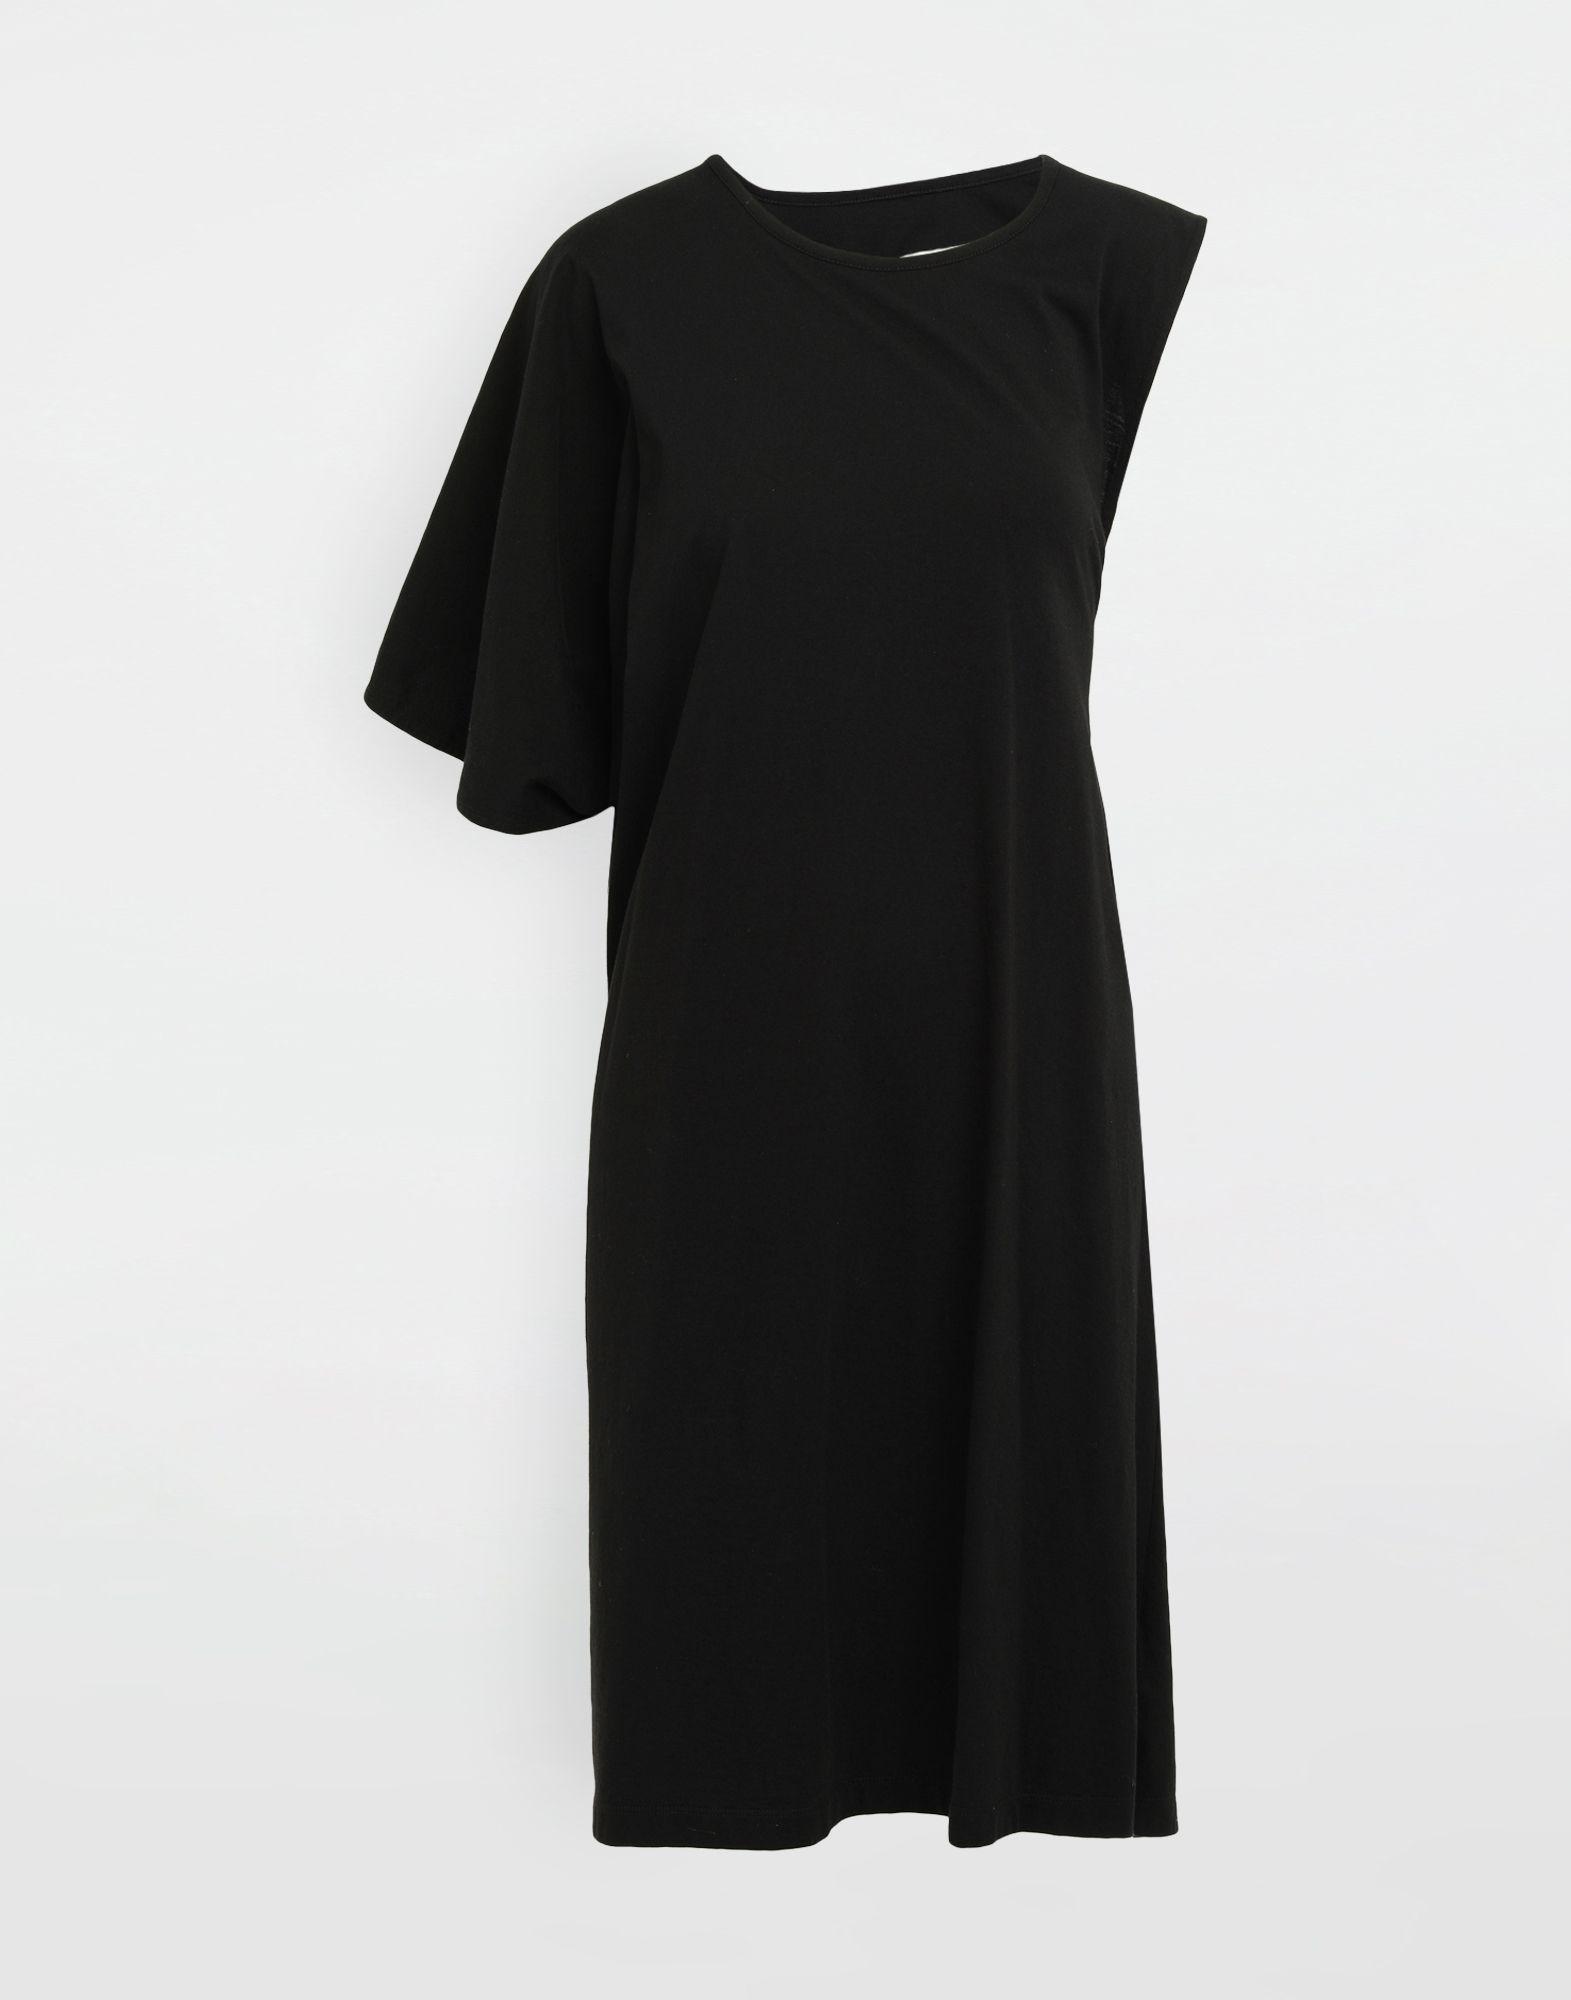 MM6 MAISON MARGIELA Asymmetrical jersey midi dress 3/4 length dress Woman f